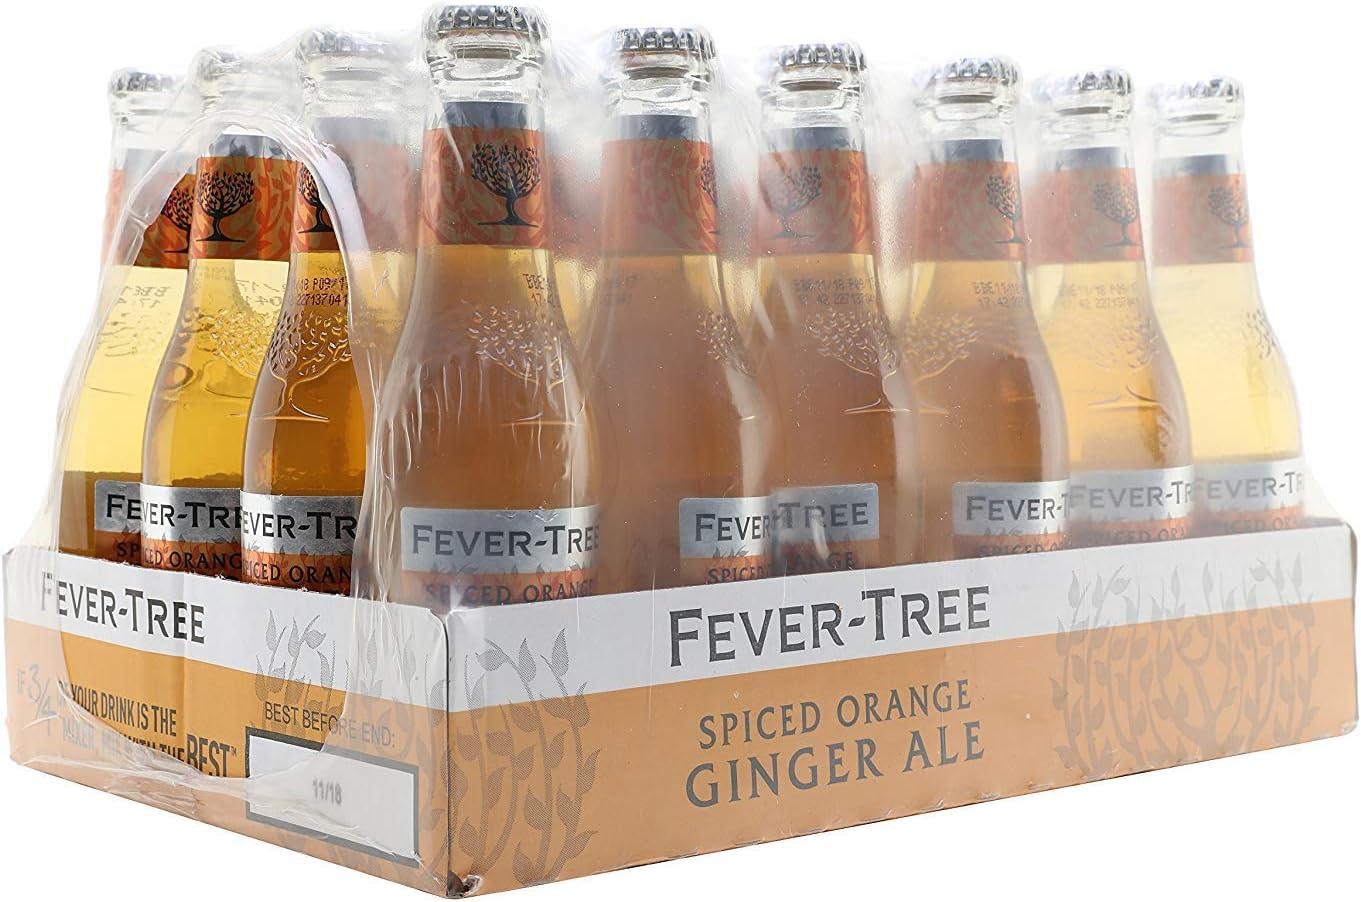 Fever-Tree Spiced Orange Ginger Ale 200 ml (Pack of 24)